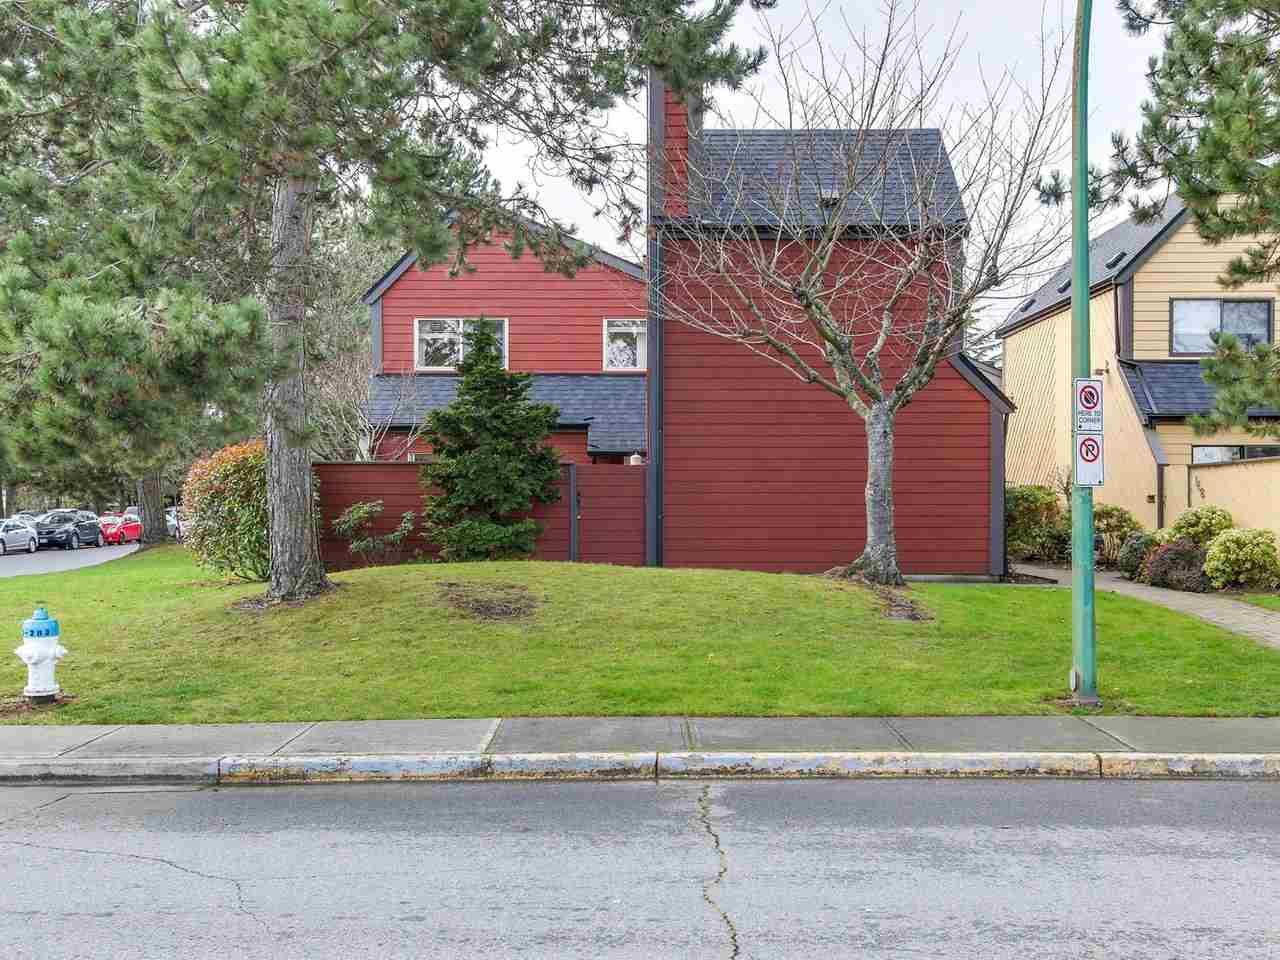 Photo 15: Photos: 106 5421 10 AVENUE in Delta: Tsawwassen Central Townhouse for sale (Tsawwassen)  : MLS®# R2232945